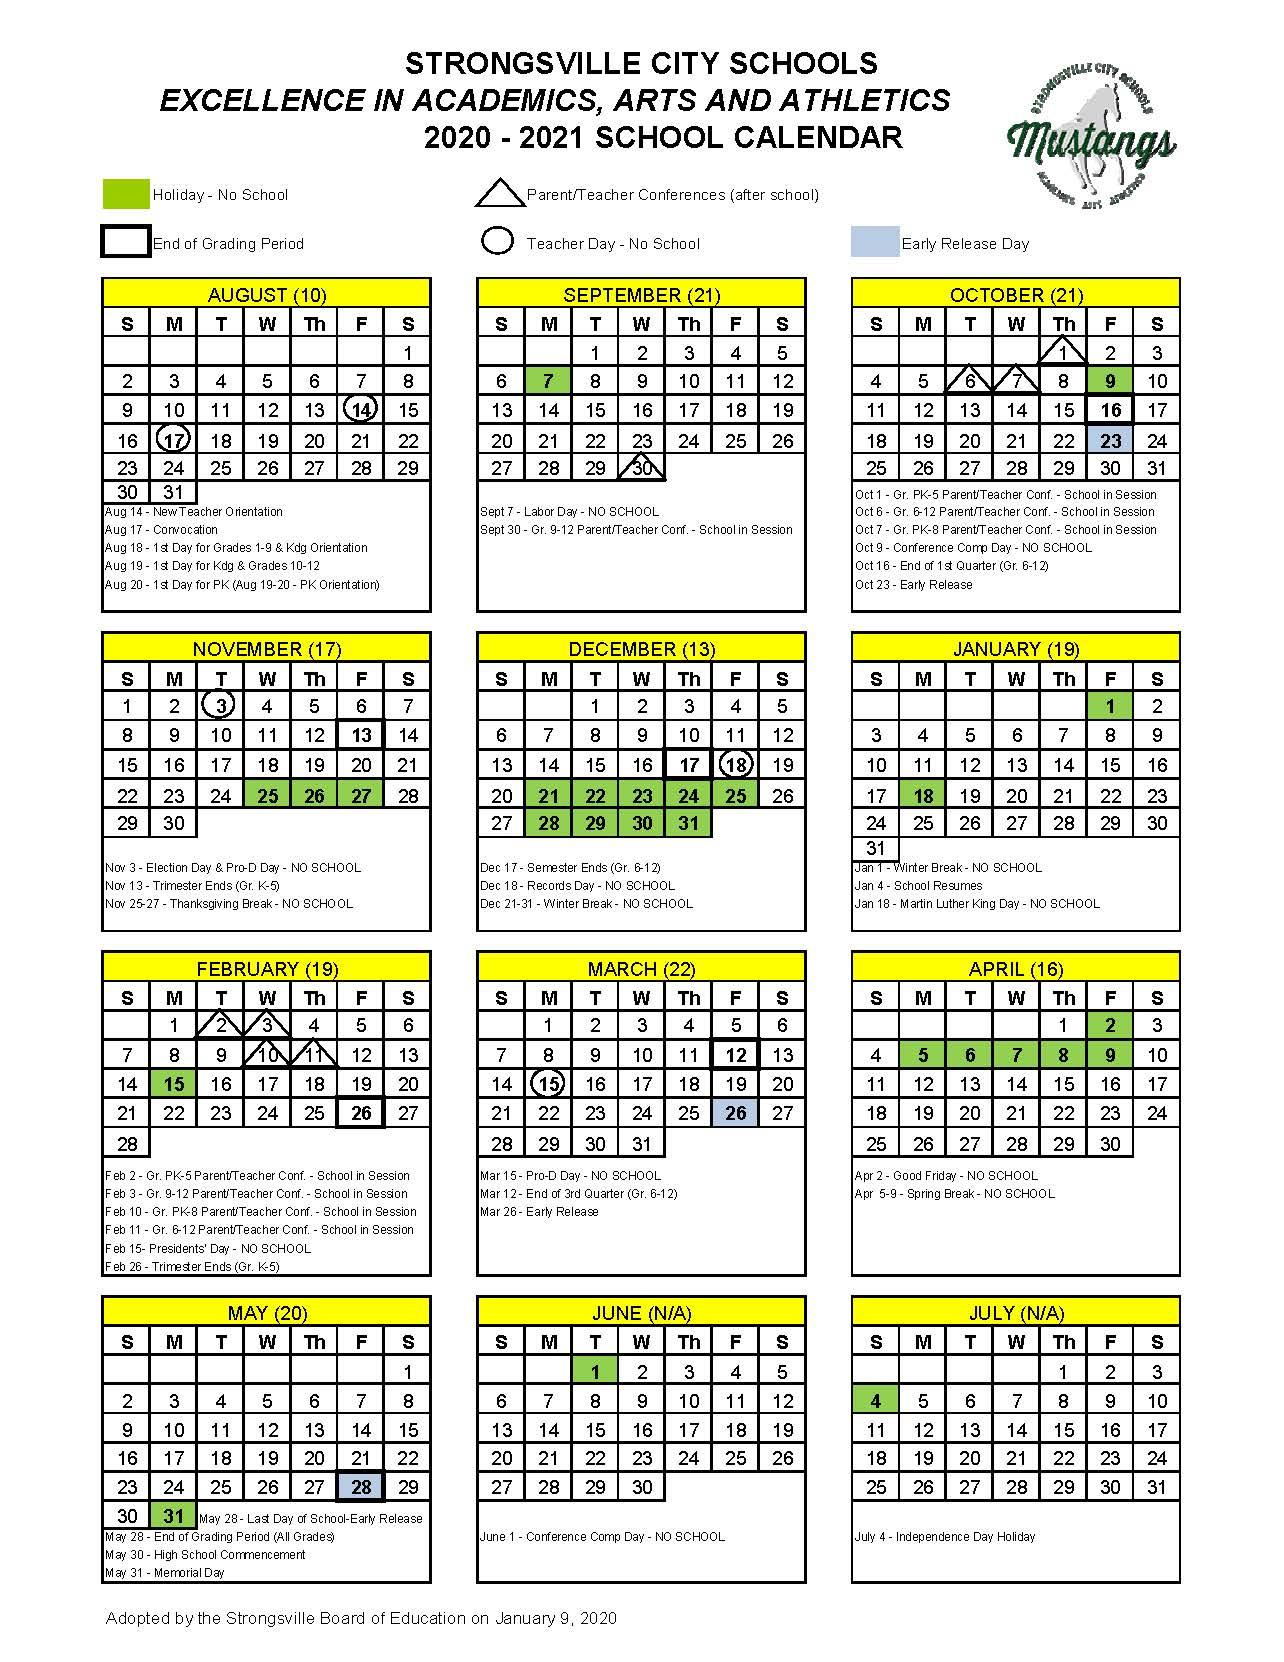 Dare County School Calendar 2021 | Printable Calendar 2020 inside Sfa 2021 Calendar